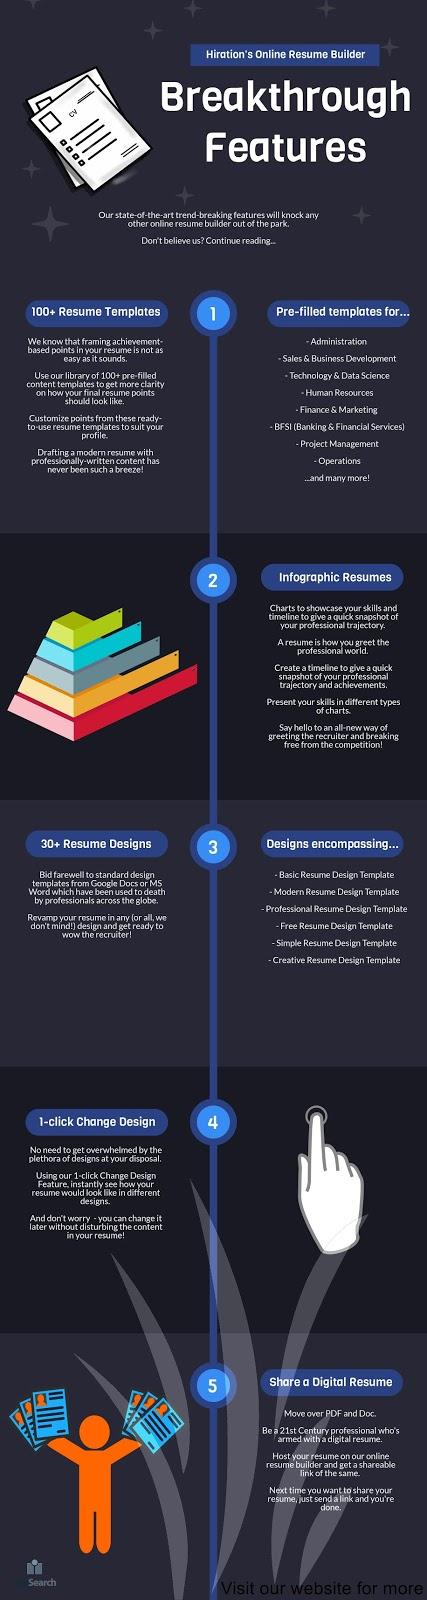 Best Resume Building Websites 2020 Resume Builder Website